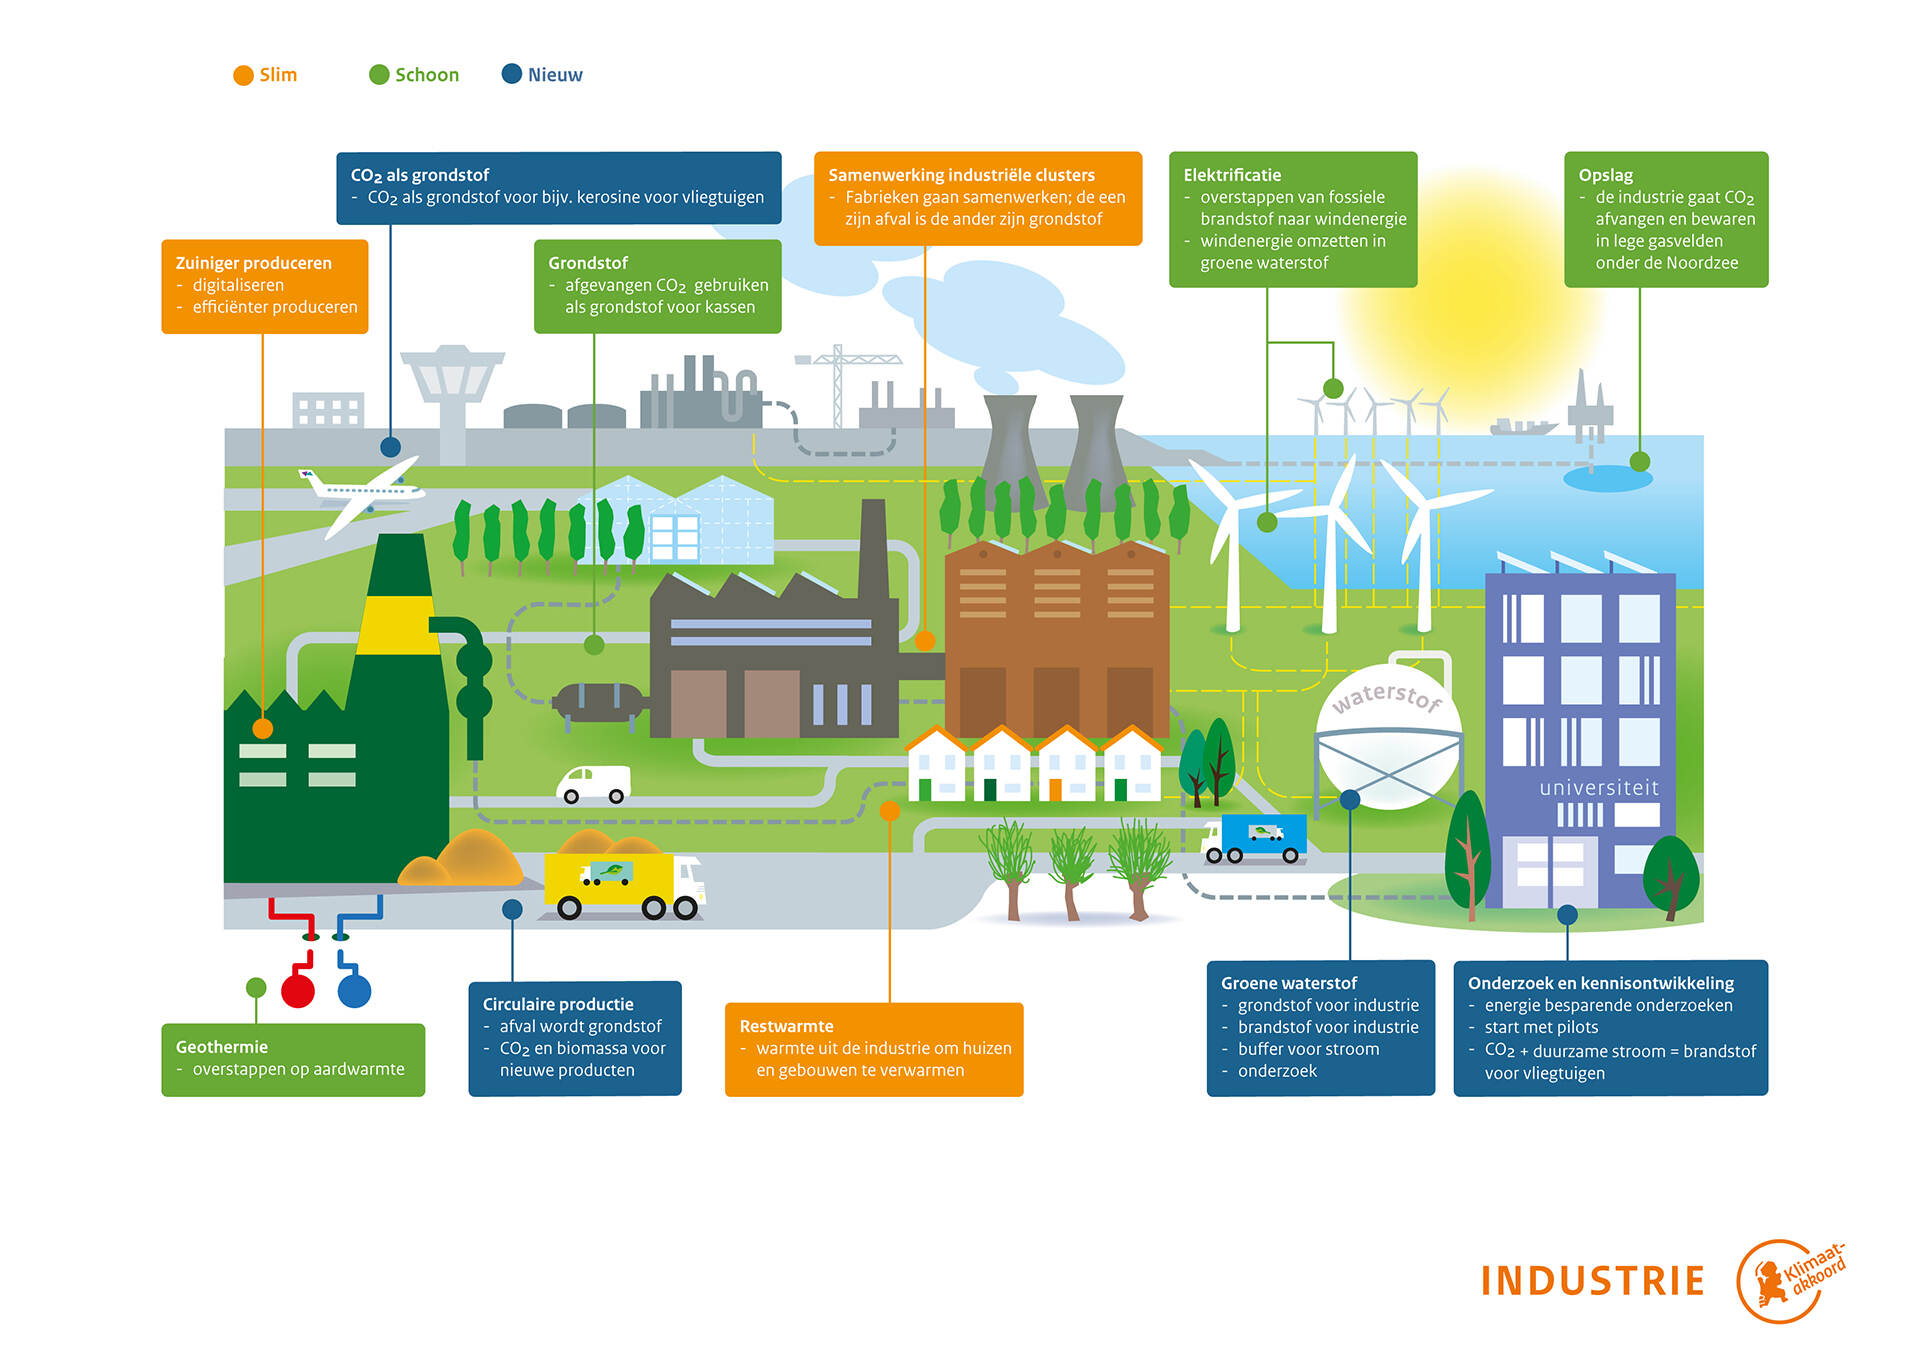 co2-reductie industrie in nederland